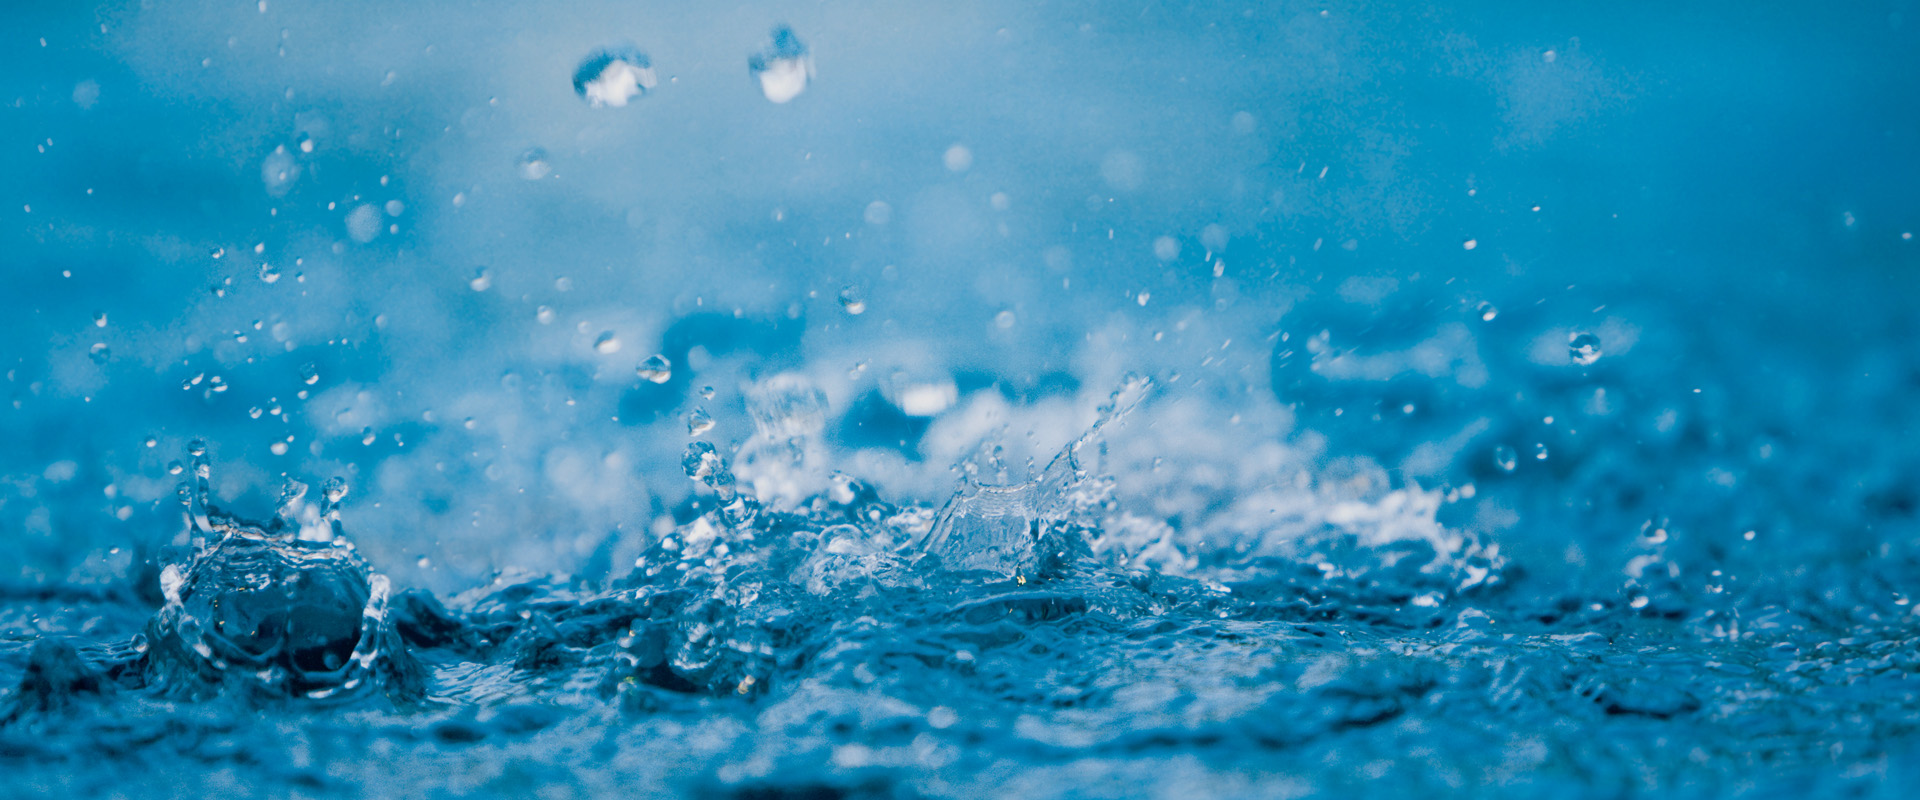 Hightlight_Waterproofing_big